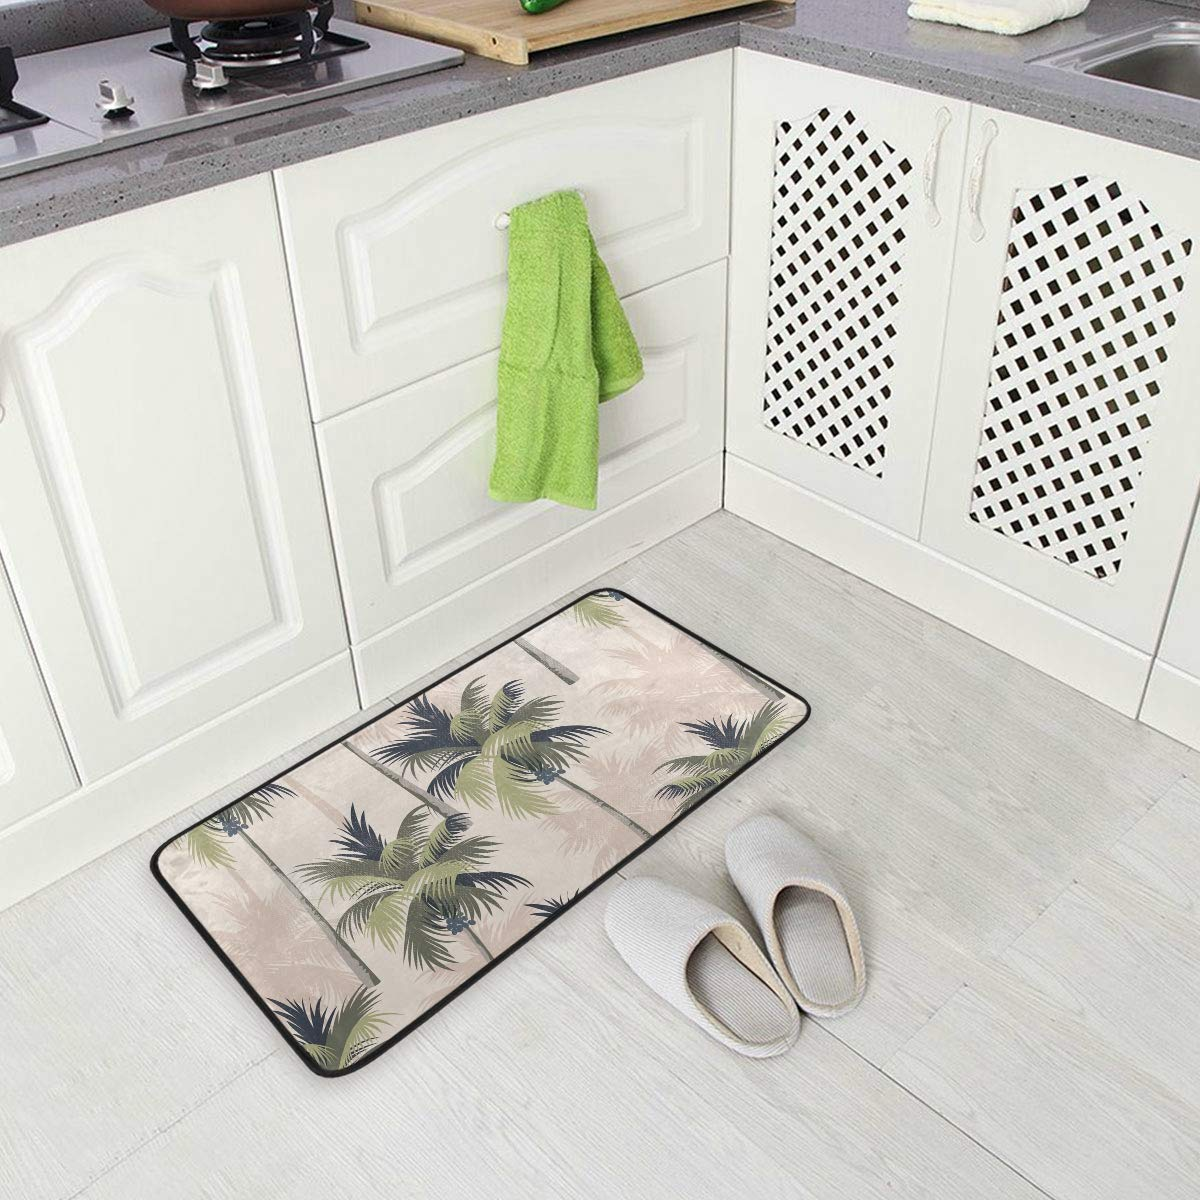 Amazon Com Kitchen Rugs Runner Vintage Tropical Palm Trees Comfort Floor Mat Bath Mats Bed Desk Bathroom Area Rug Long Doormat Carpet Home Hotel Kitchen Dining